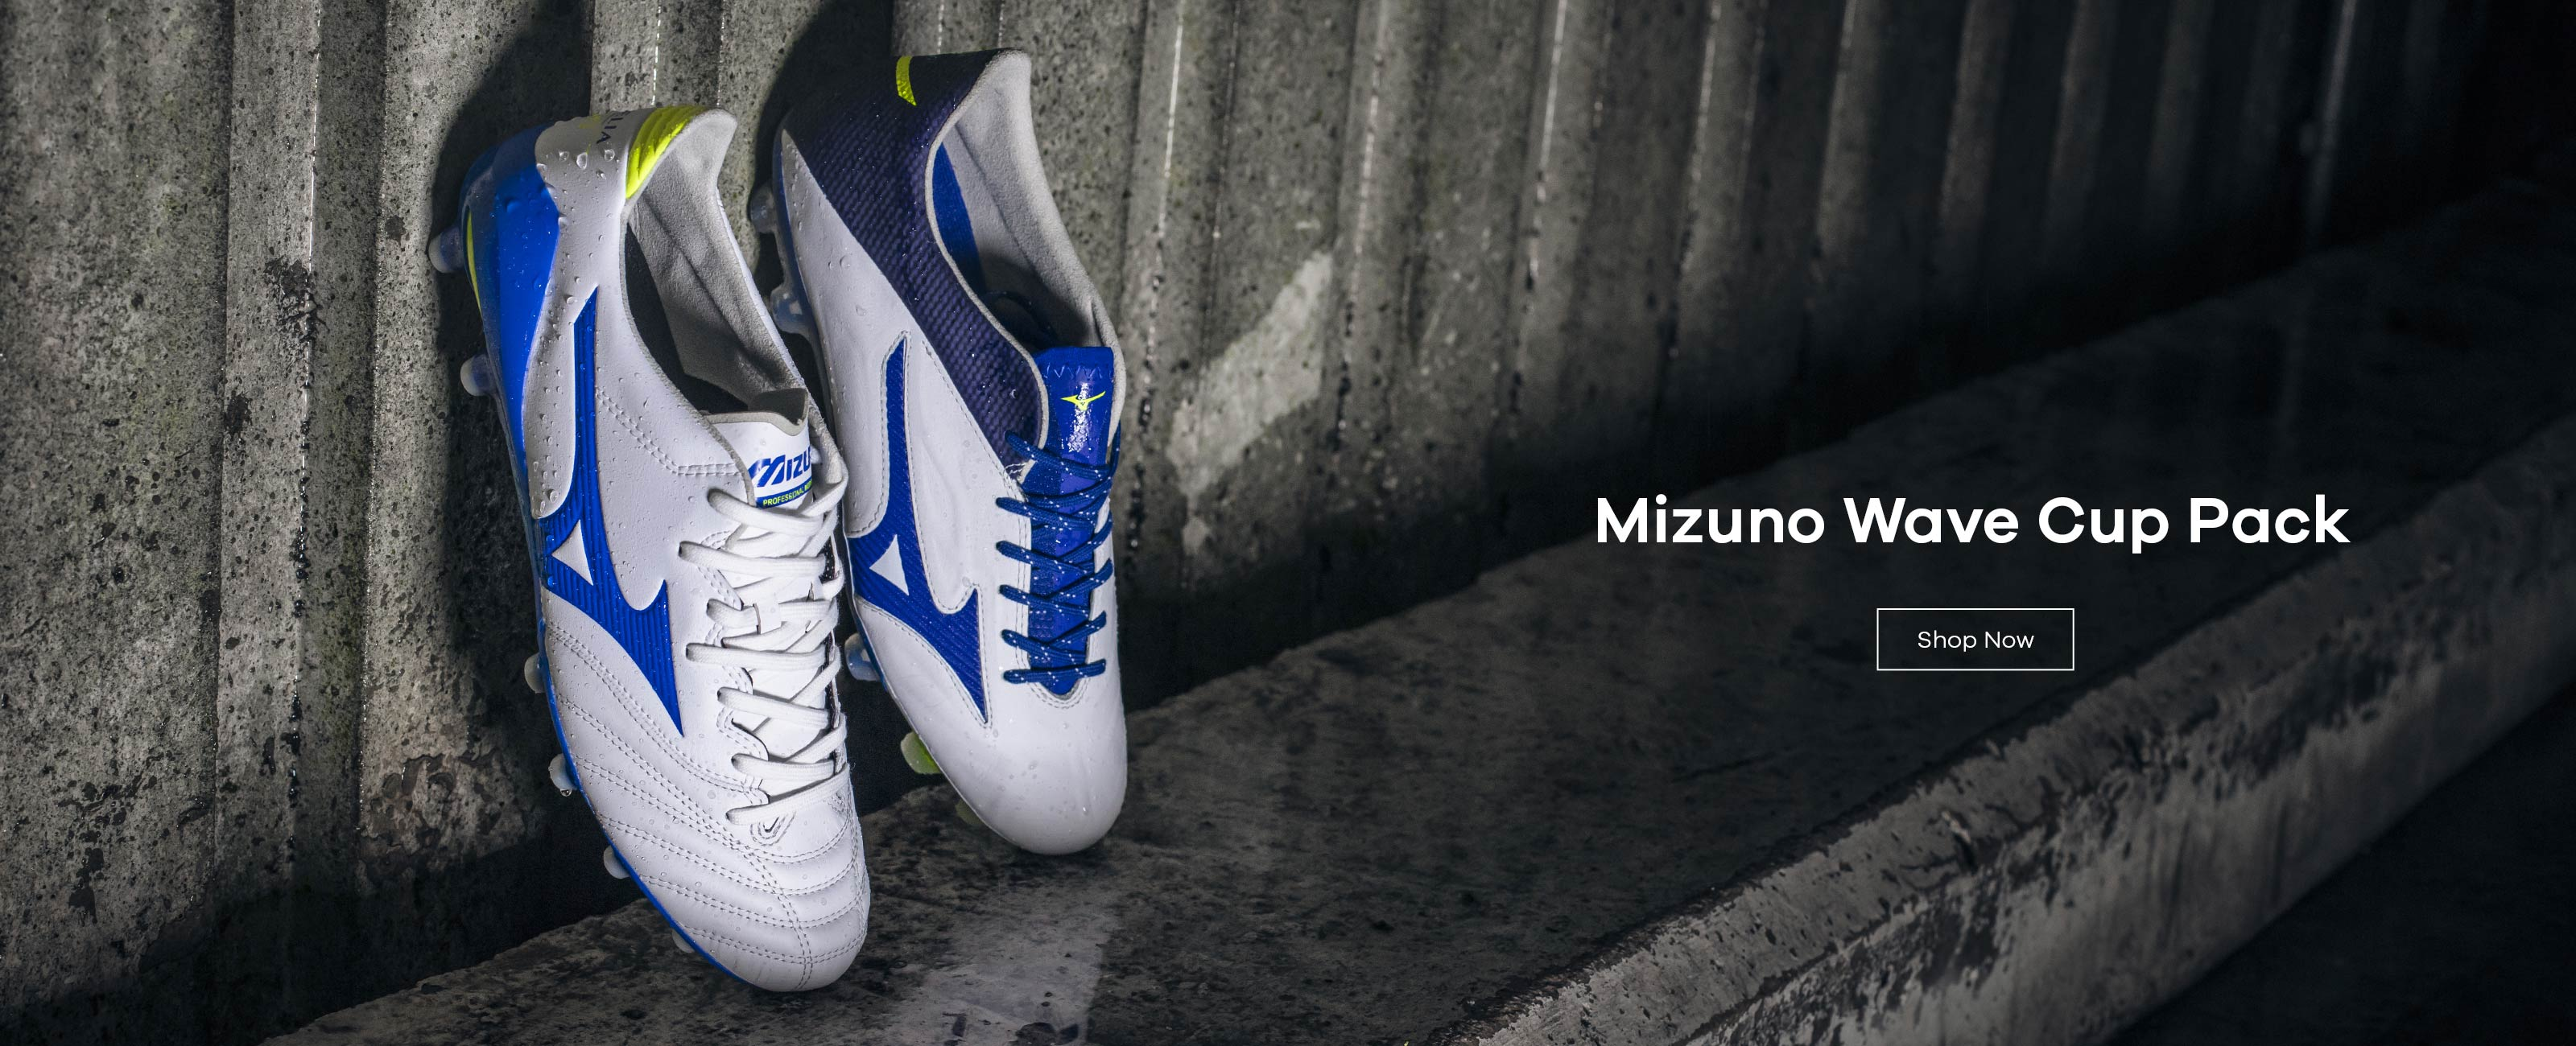 77f63508bd09 on sale 0c2be 21978 savon noir sneakers sale - elwatanweb.com